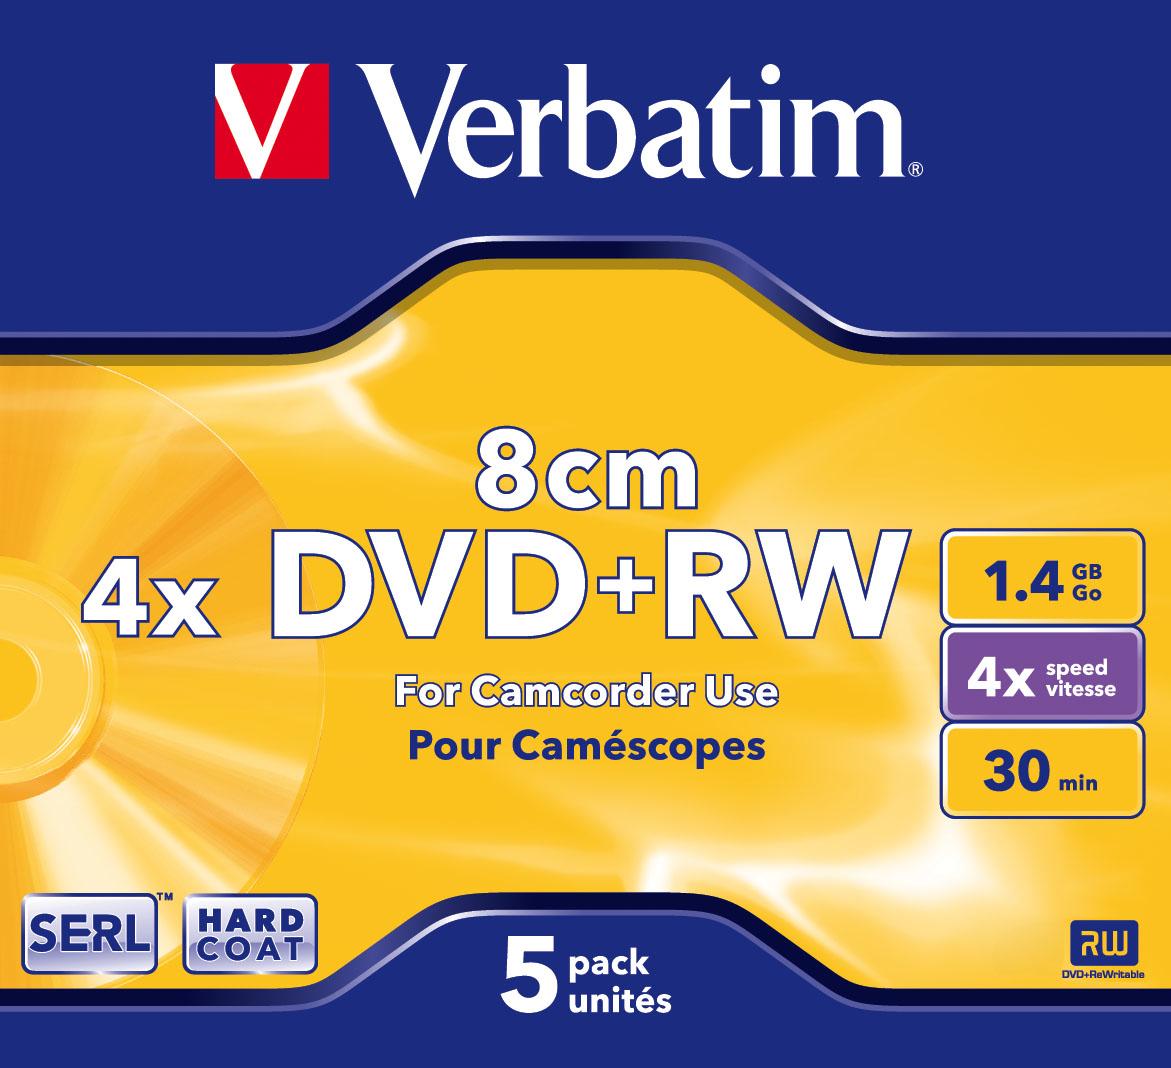 Verbatim DVD+RW 8cm Matt Silver 1.4 GB 5 pc(s)